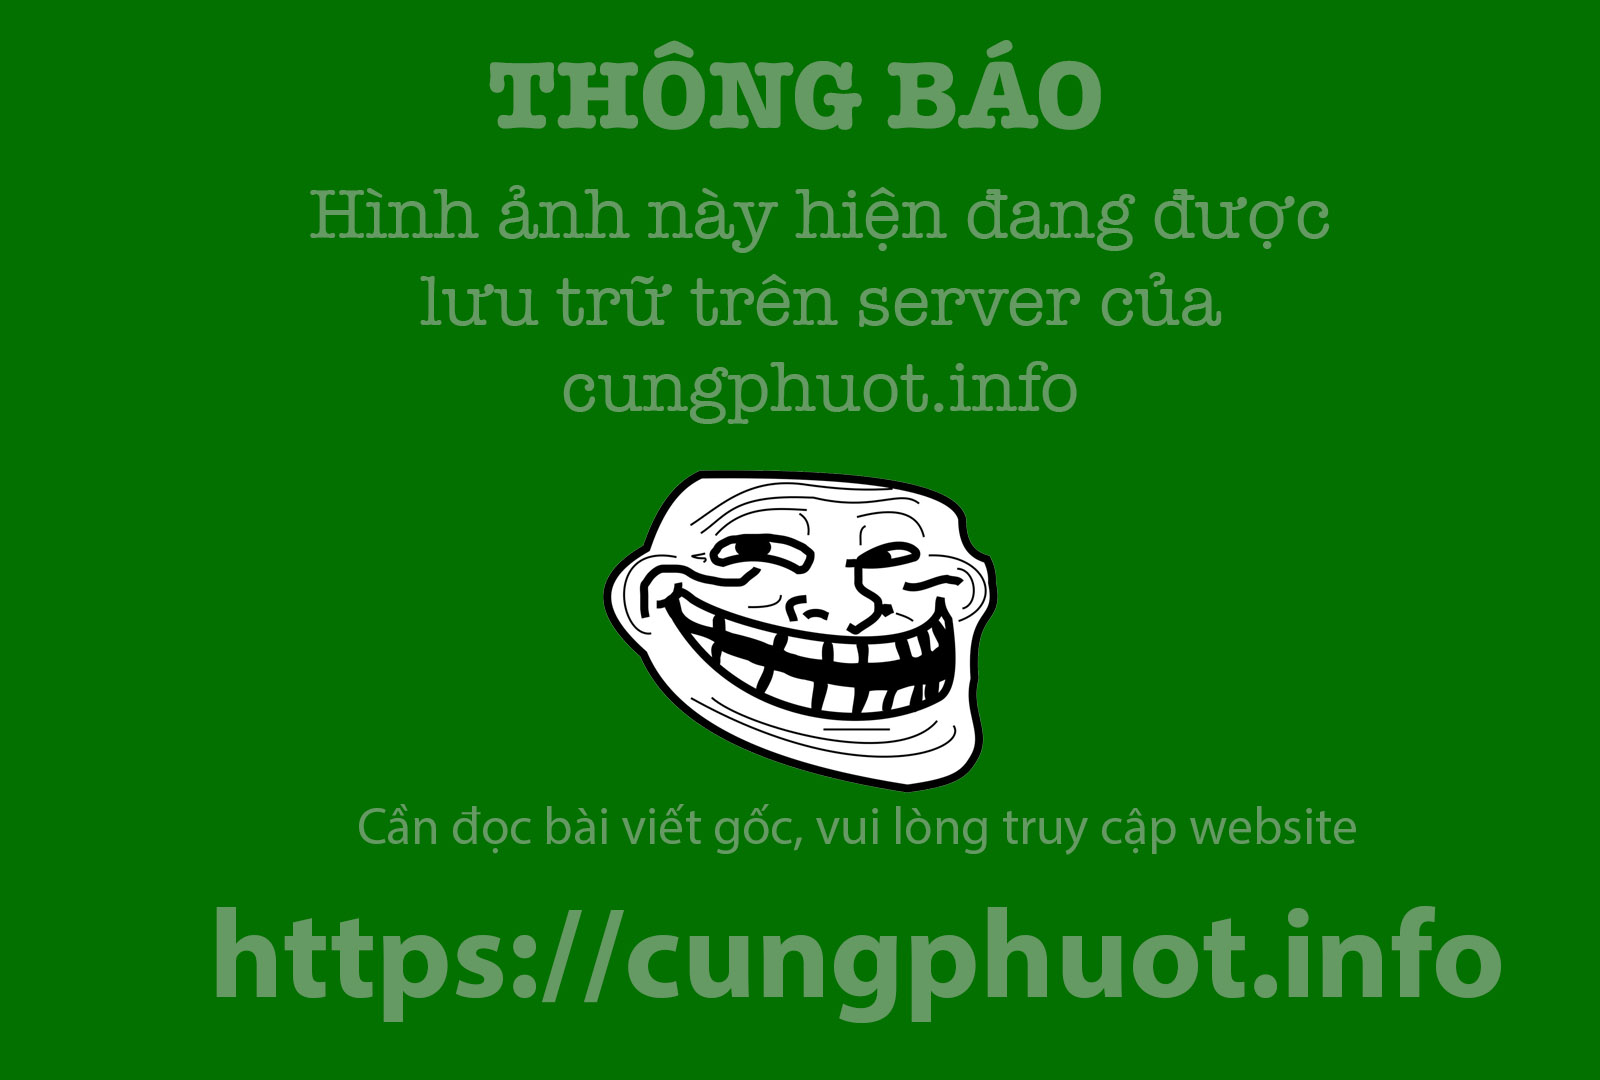 nhung-tiem-ca-phe-dep-phai-di-mot-lan-cho-biet-o-da-nang-ivivu-6